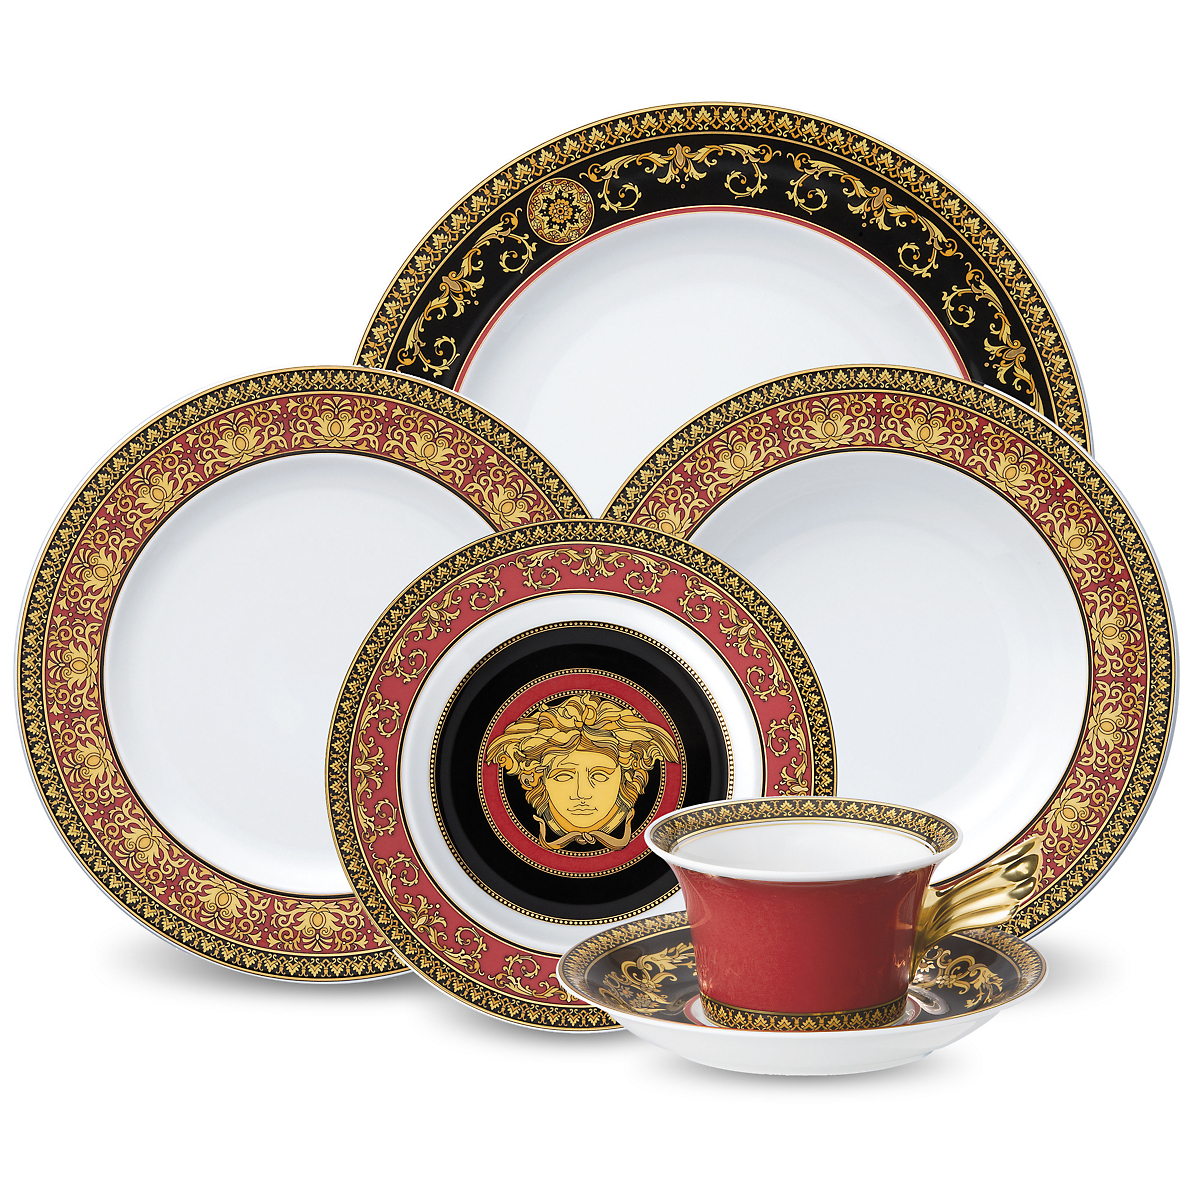 Versace Medusa Dinnerware Red  sc 1 st  Gumpu0027s & Versace Medusa Dinnerware Red   Gumpu0027s